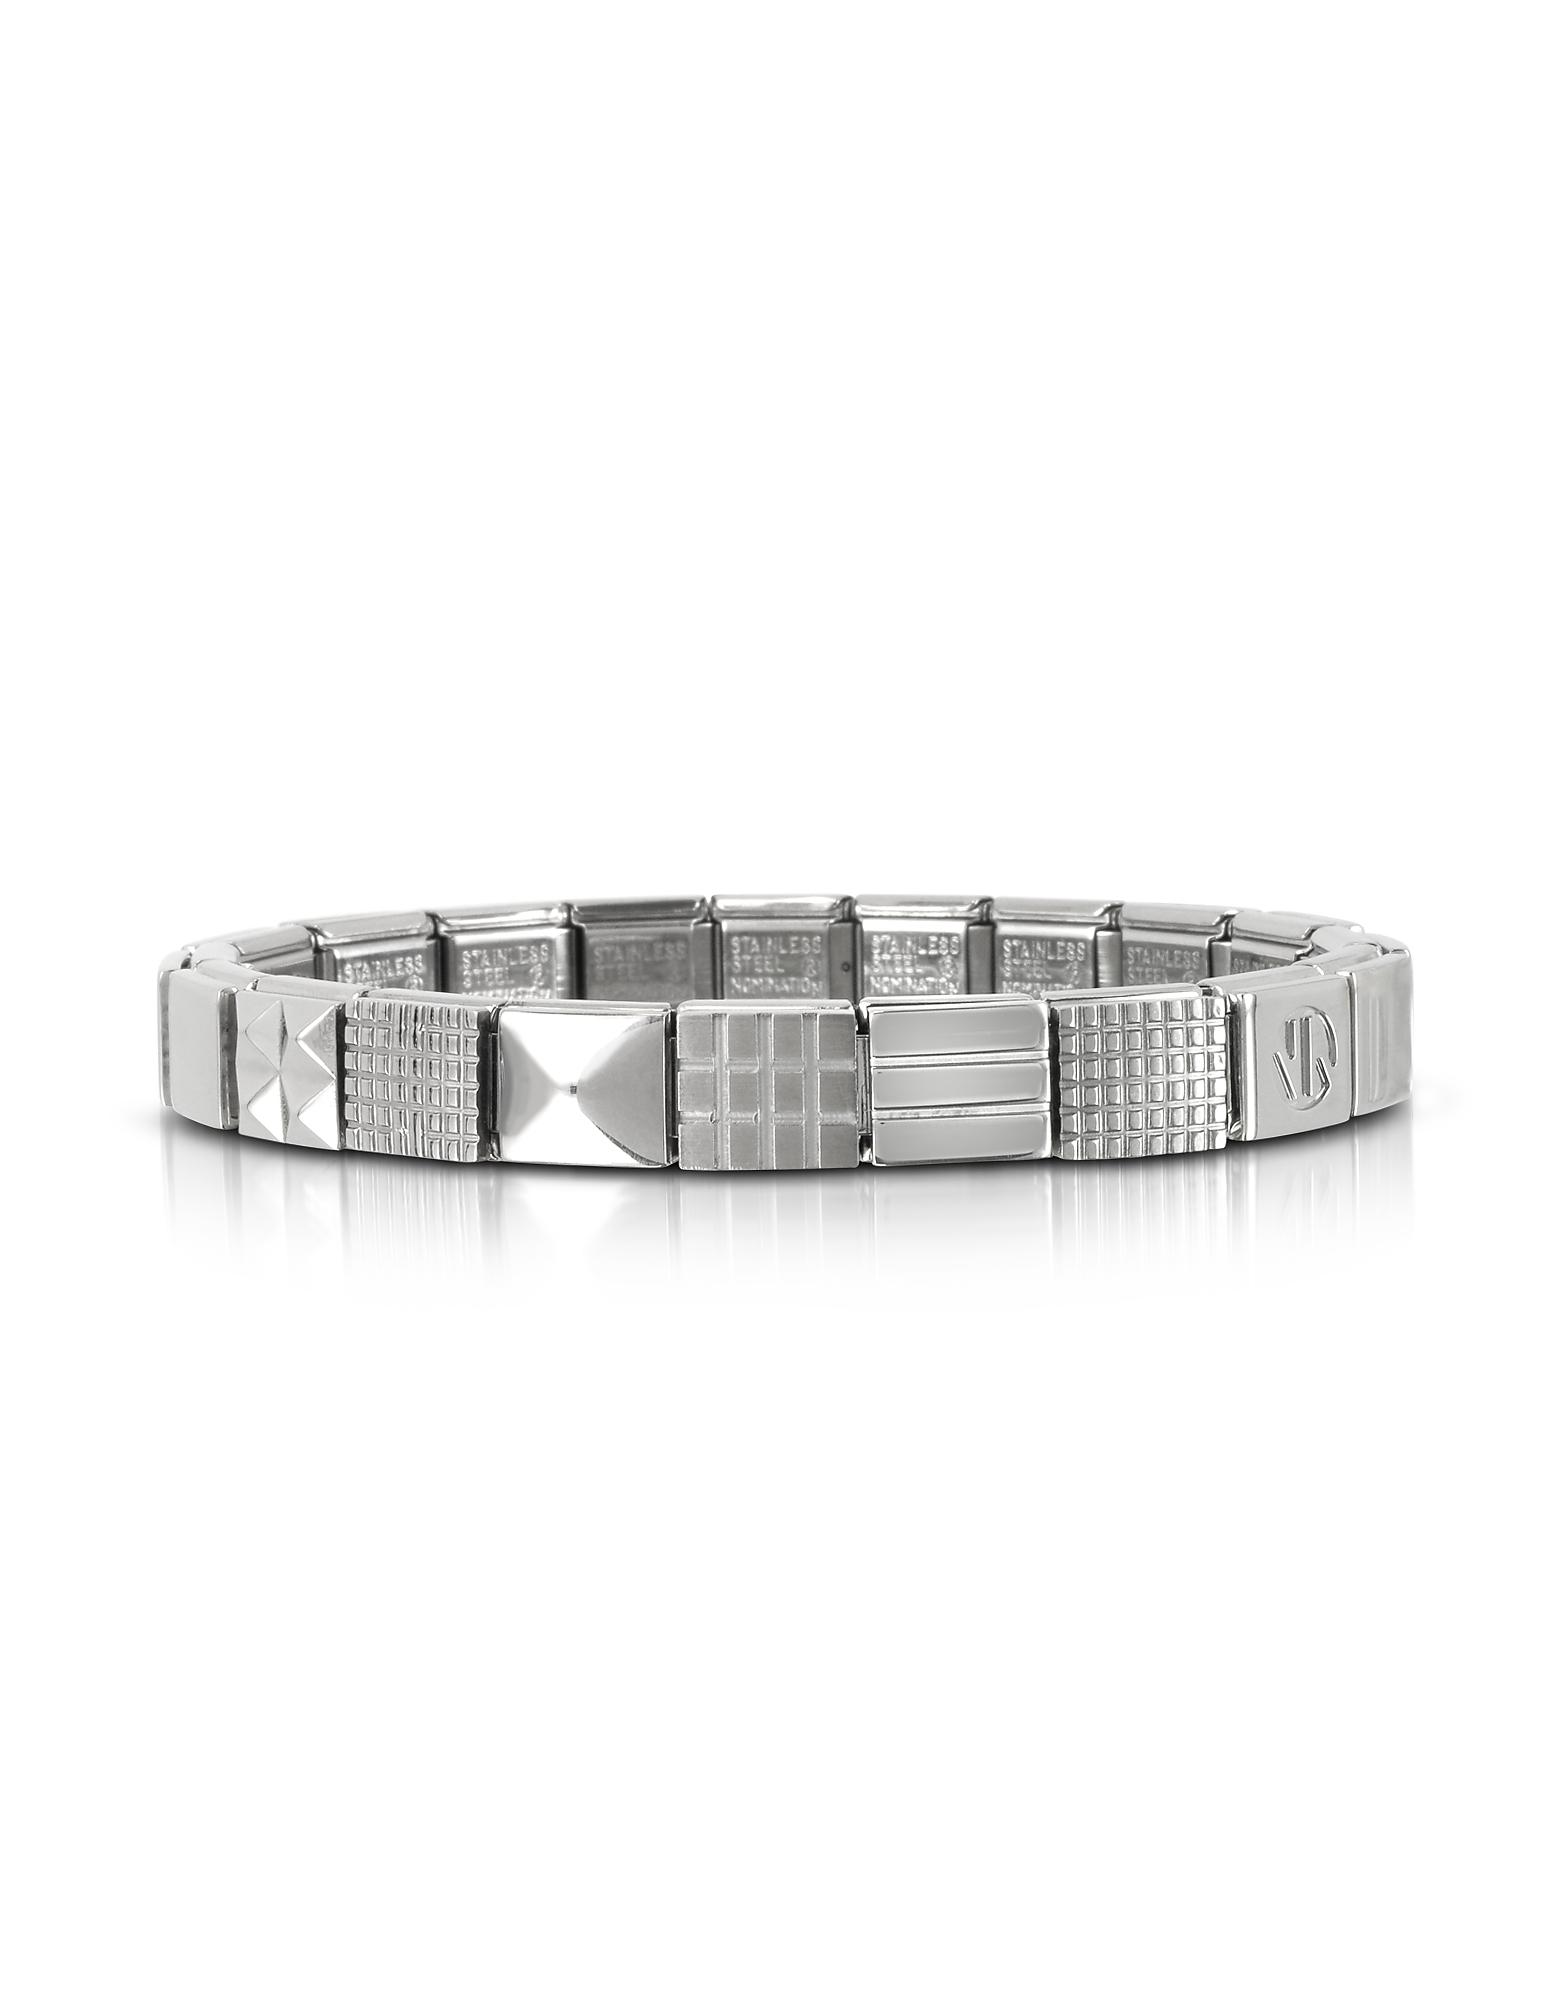 Nomination Men's Bracelets, Steel Ikons Minimal Stainless Steel Bracelet